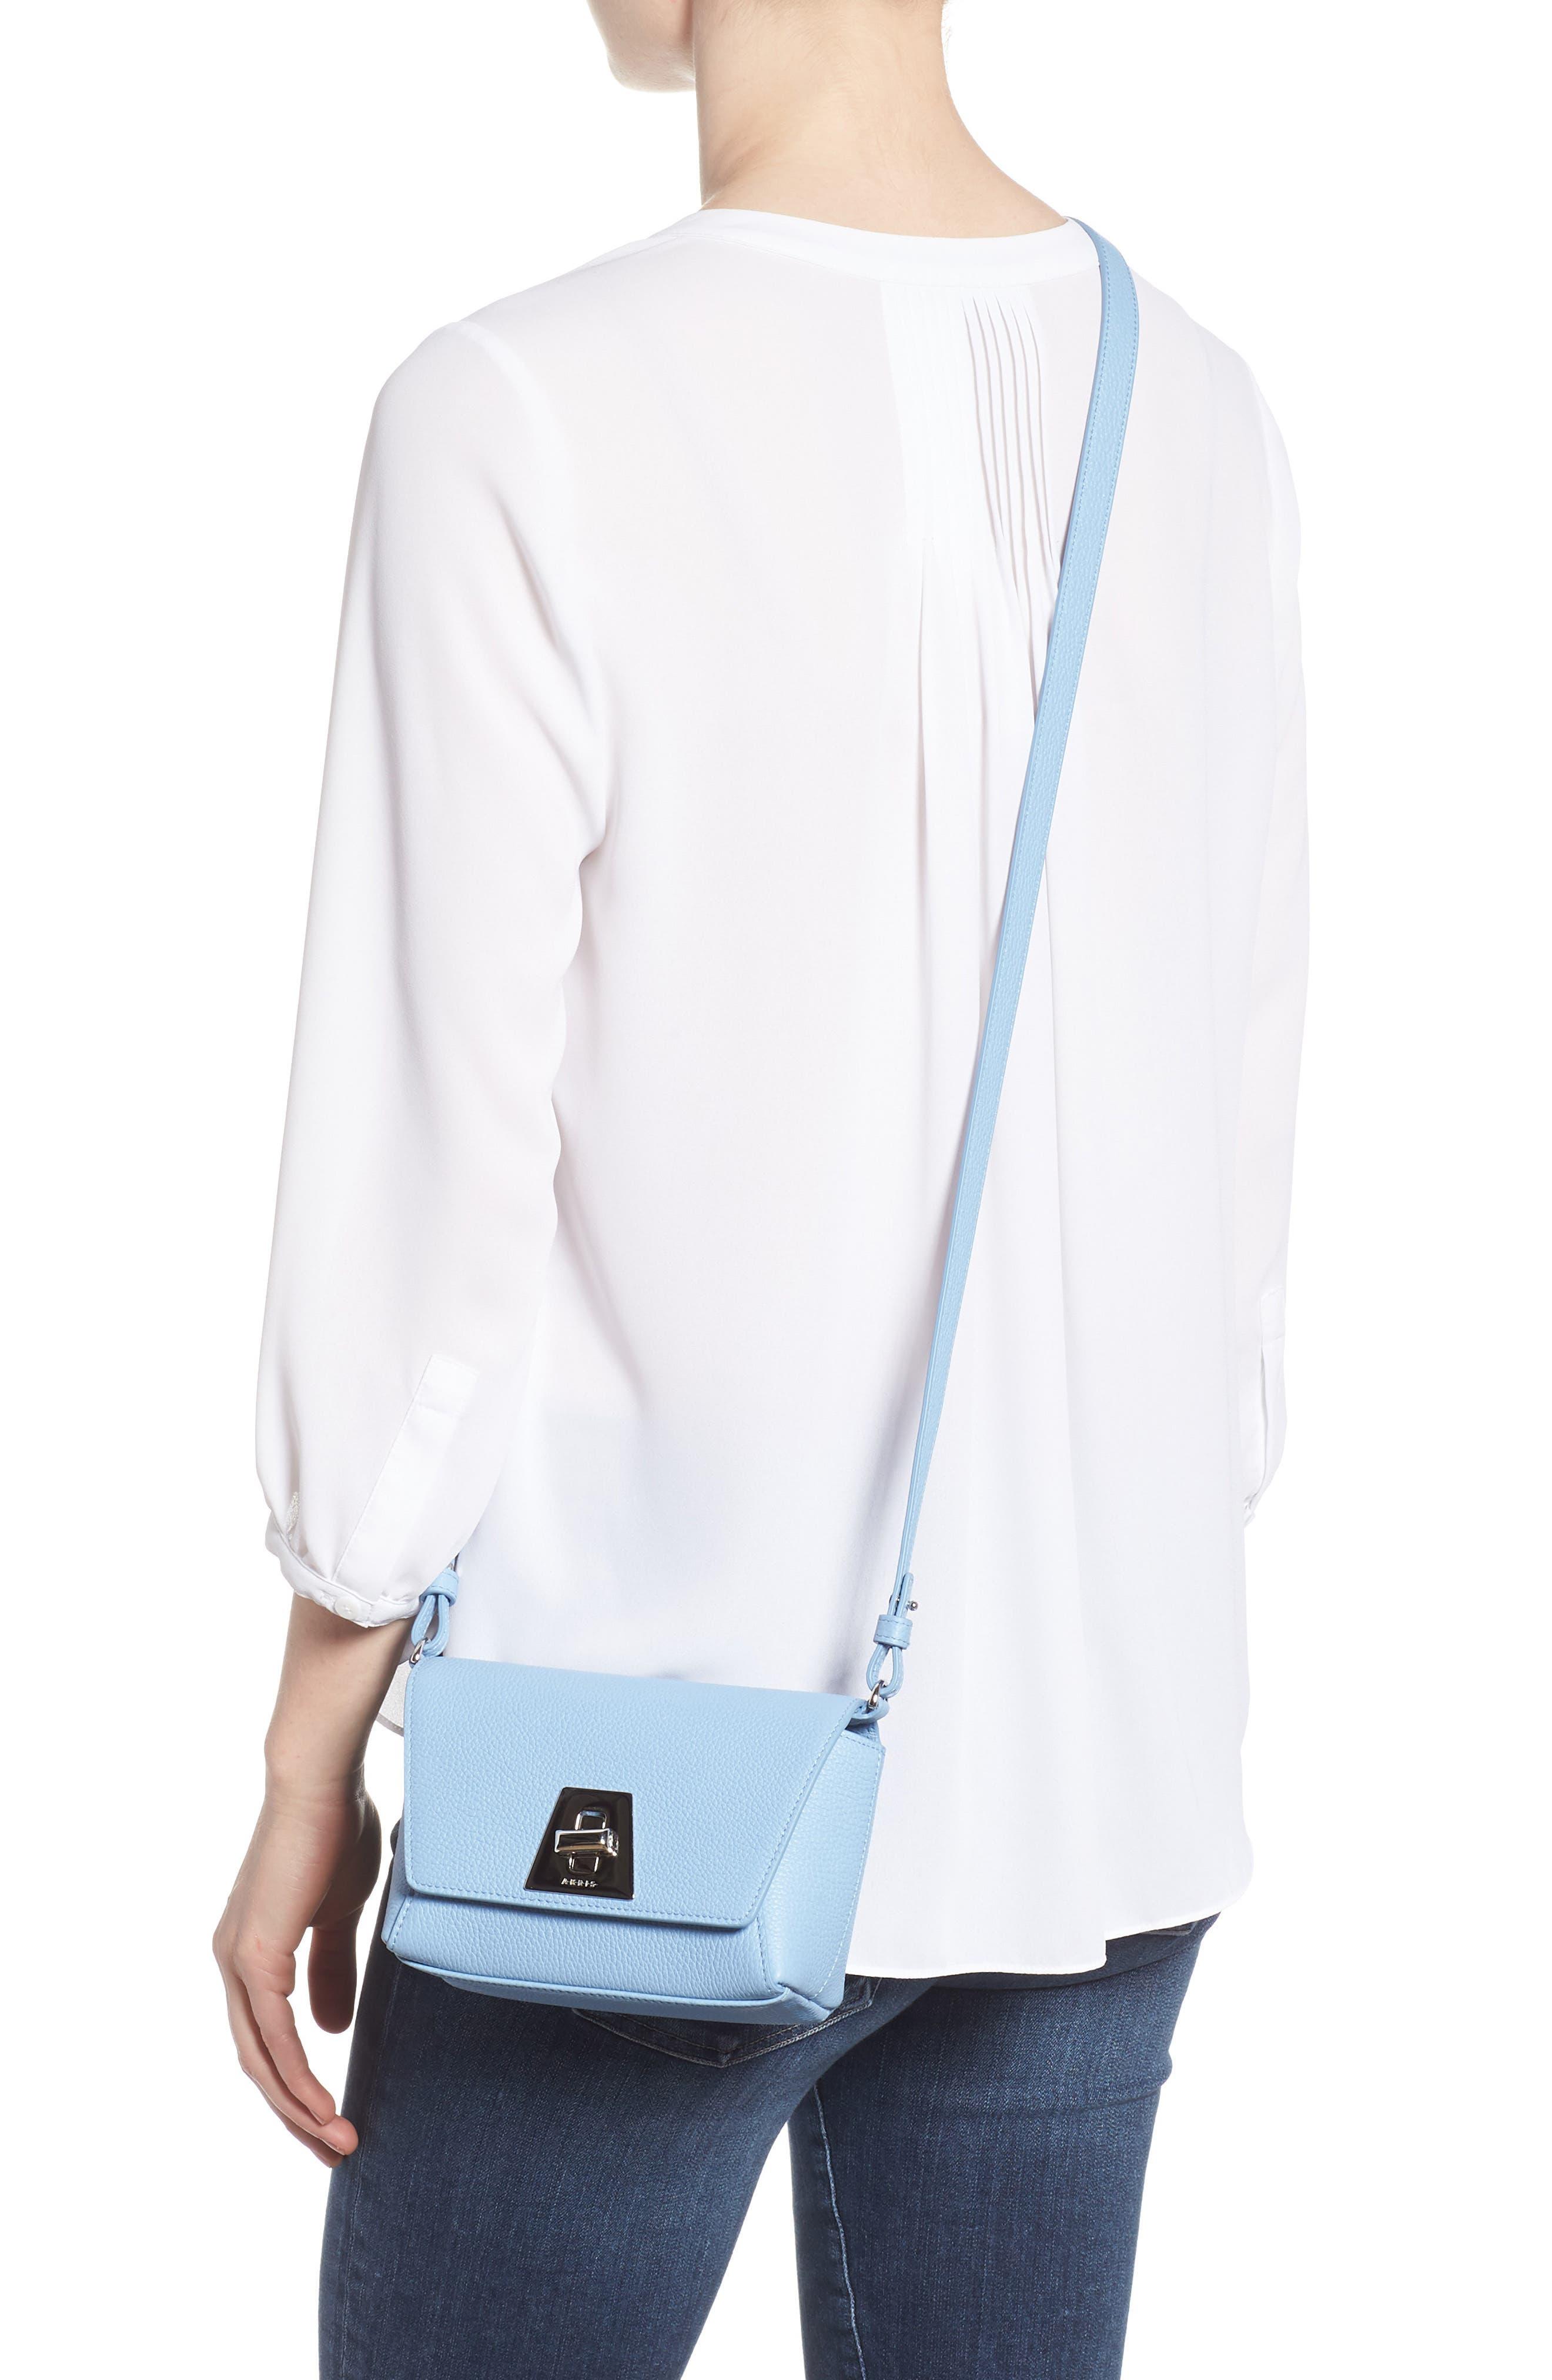 Little Anouk Calfskin Crossbody Bag,                             Alternate thumbnail 2, color,                             POWDER BLUE